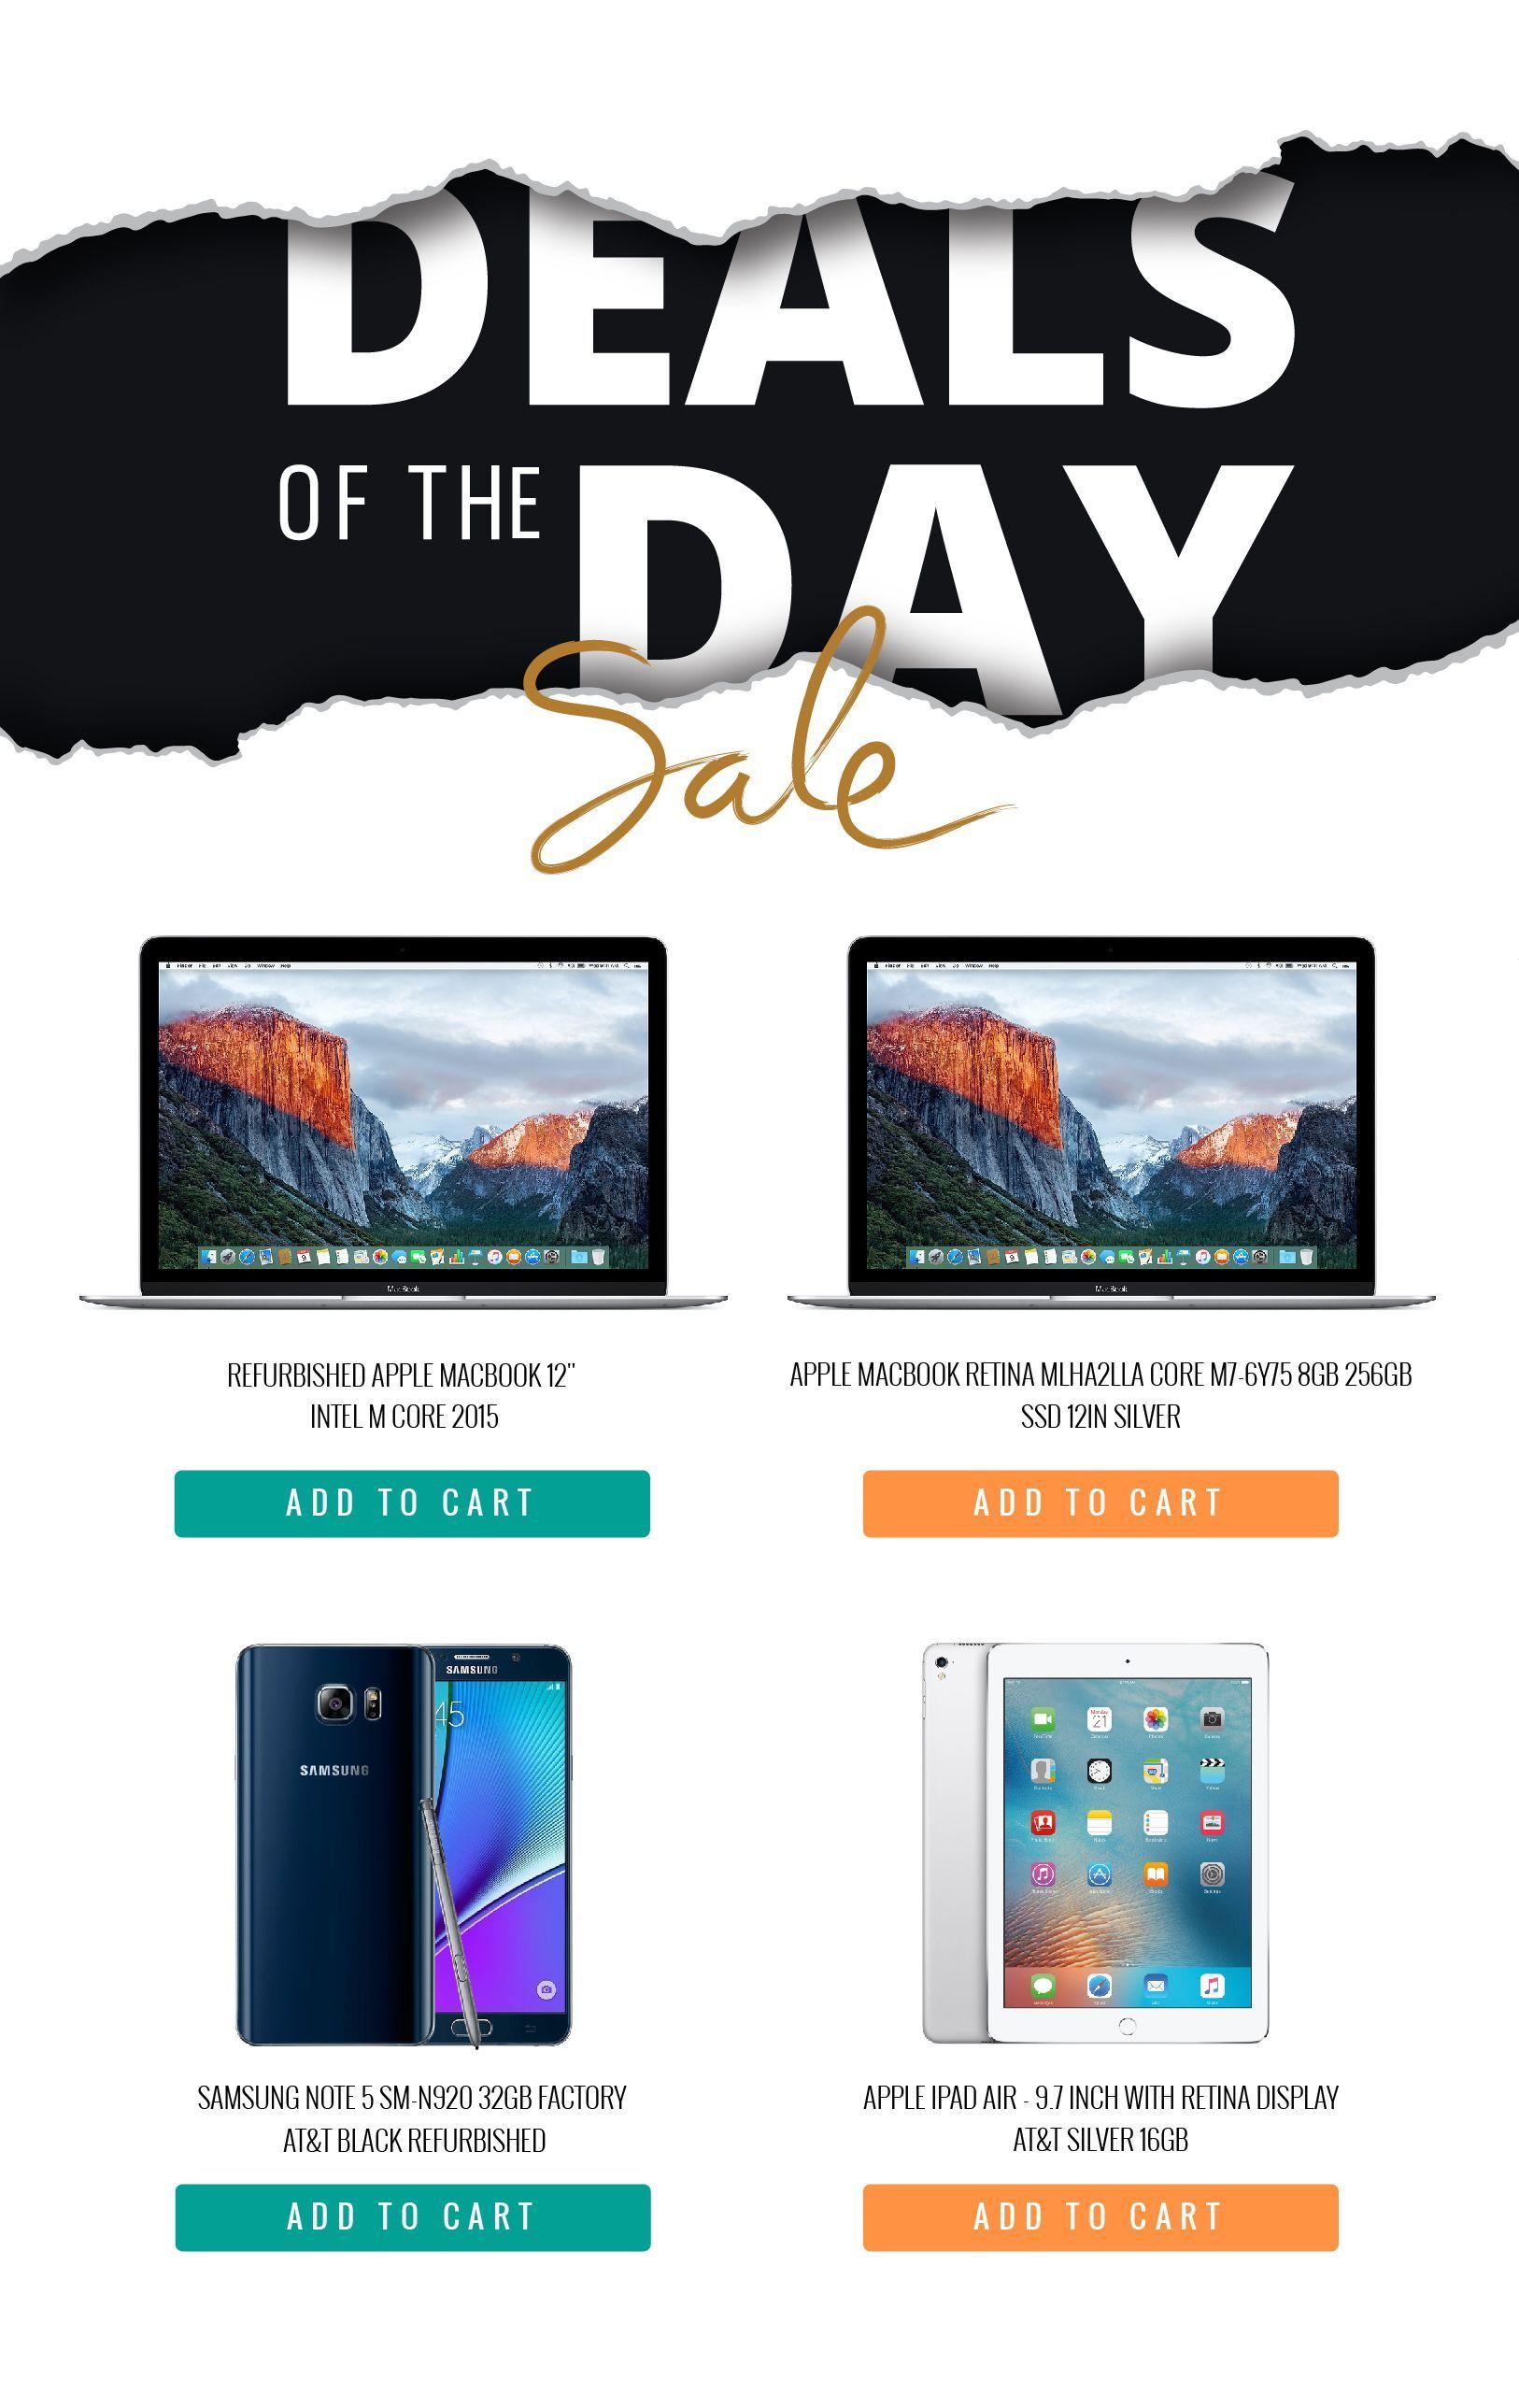 Deals That Can T Be Beat Ipad Pro Wallpaper Samsung Note Apple Ipad Air